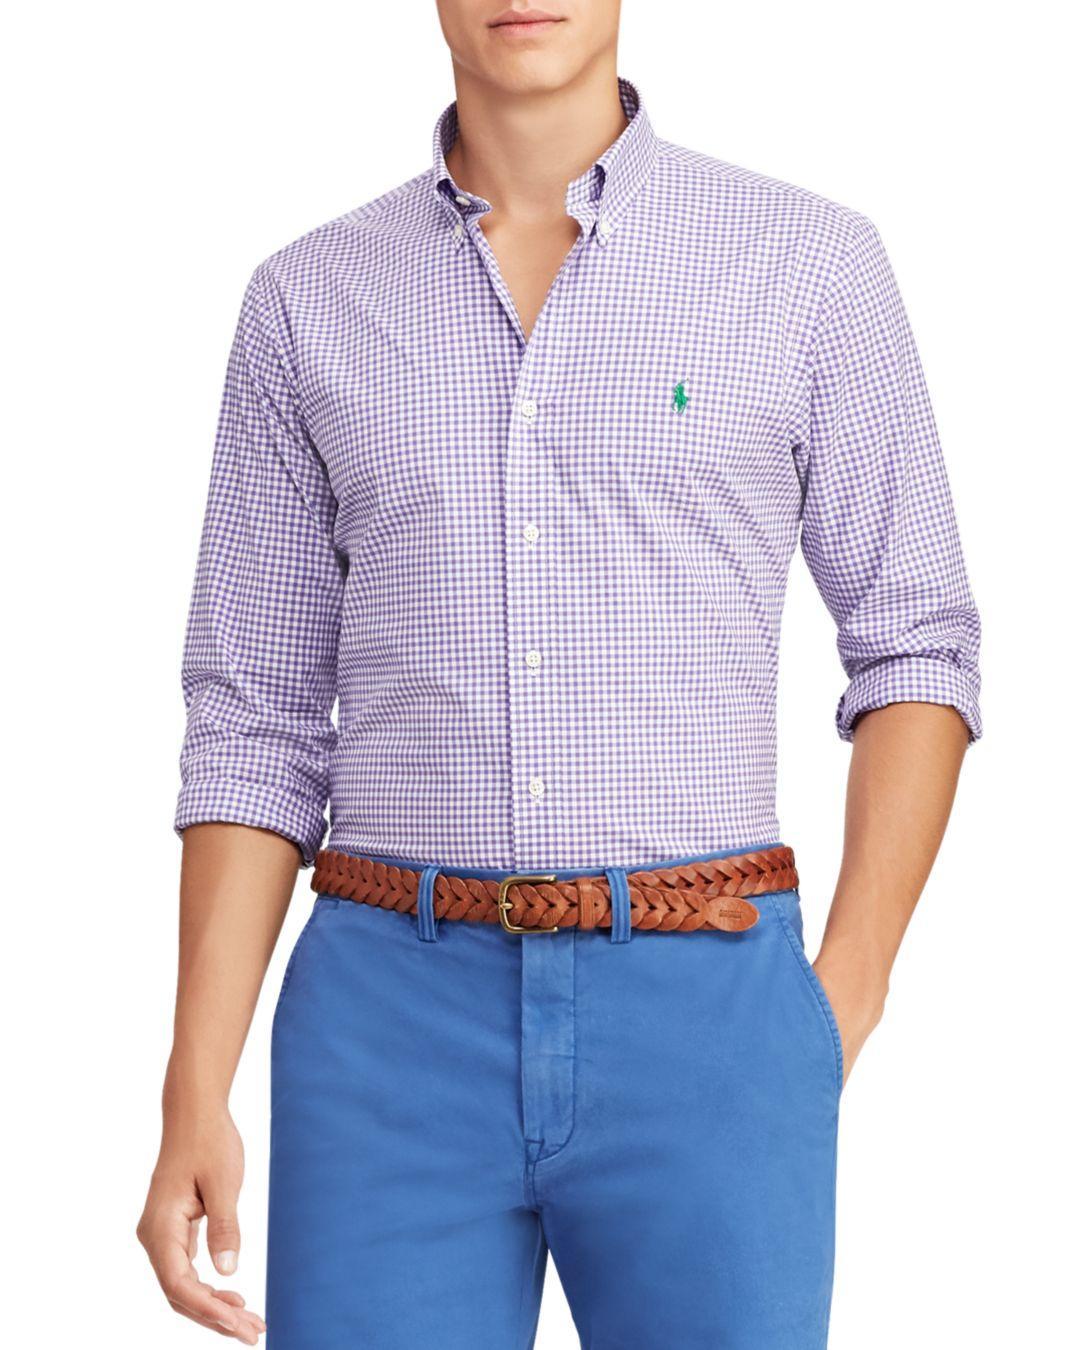 b3437fa83 Polo Ralph Lauren. Men's Purple Gingham Slim Fit Button-down Poplin Shirt